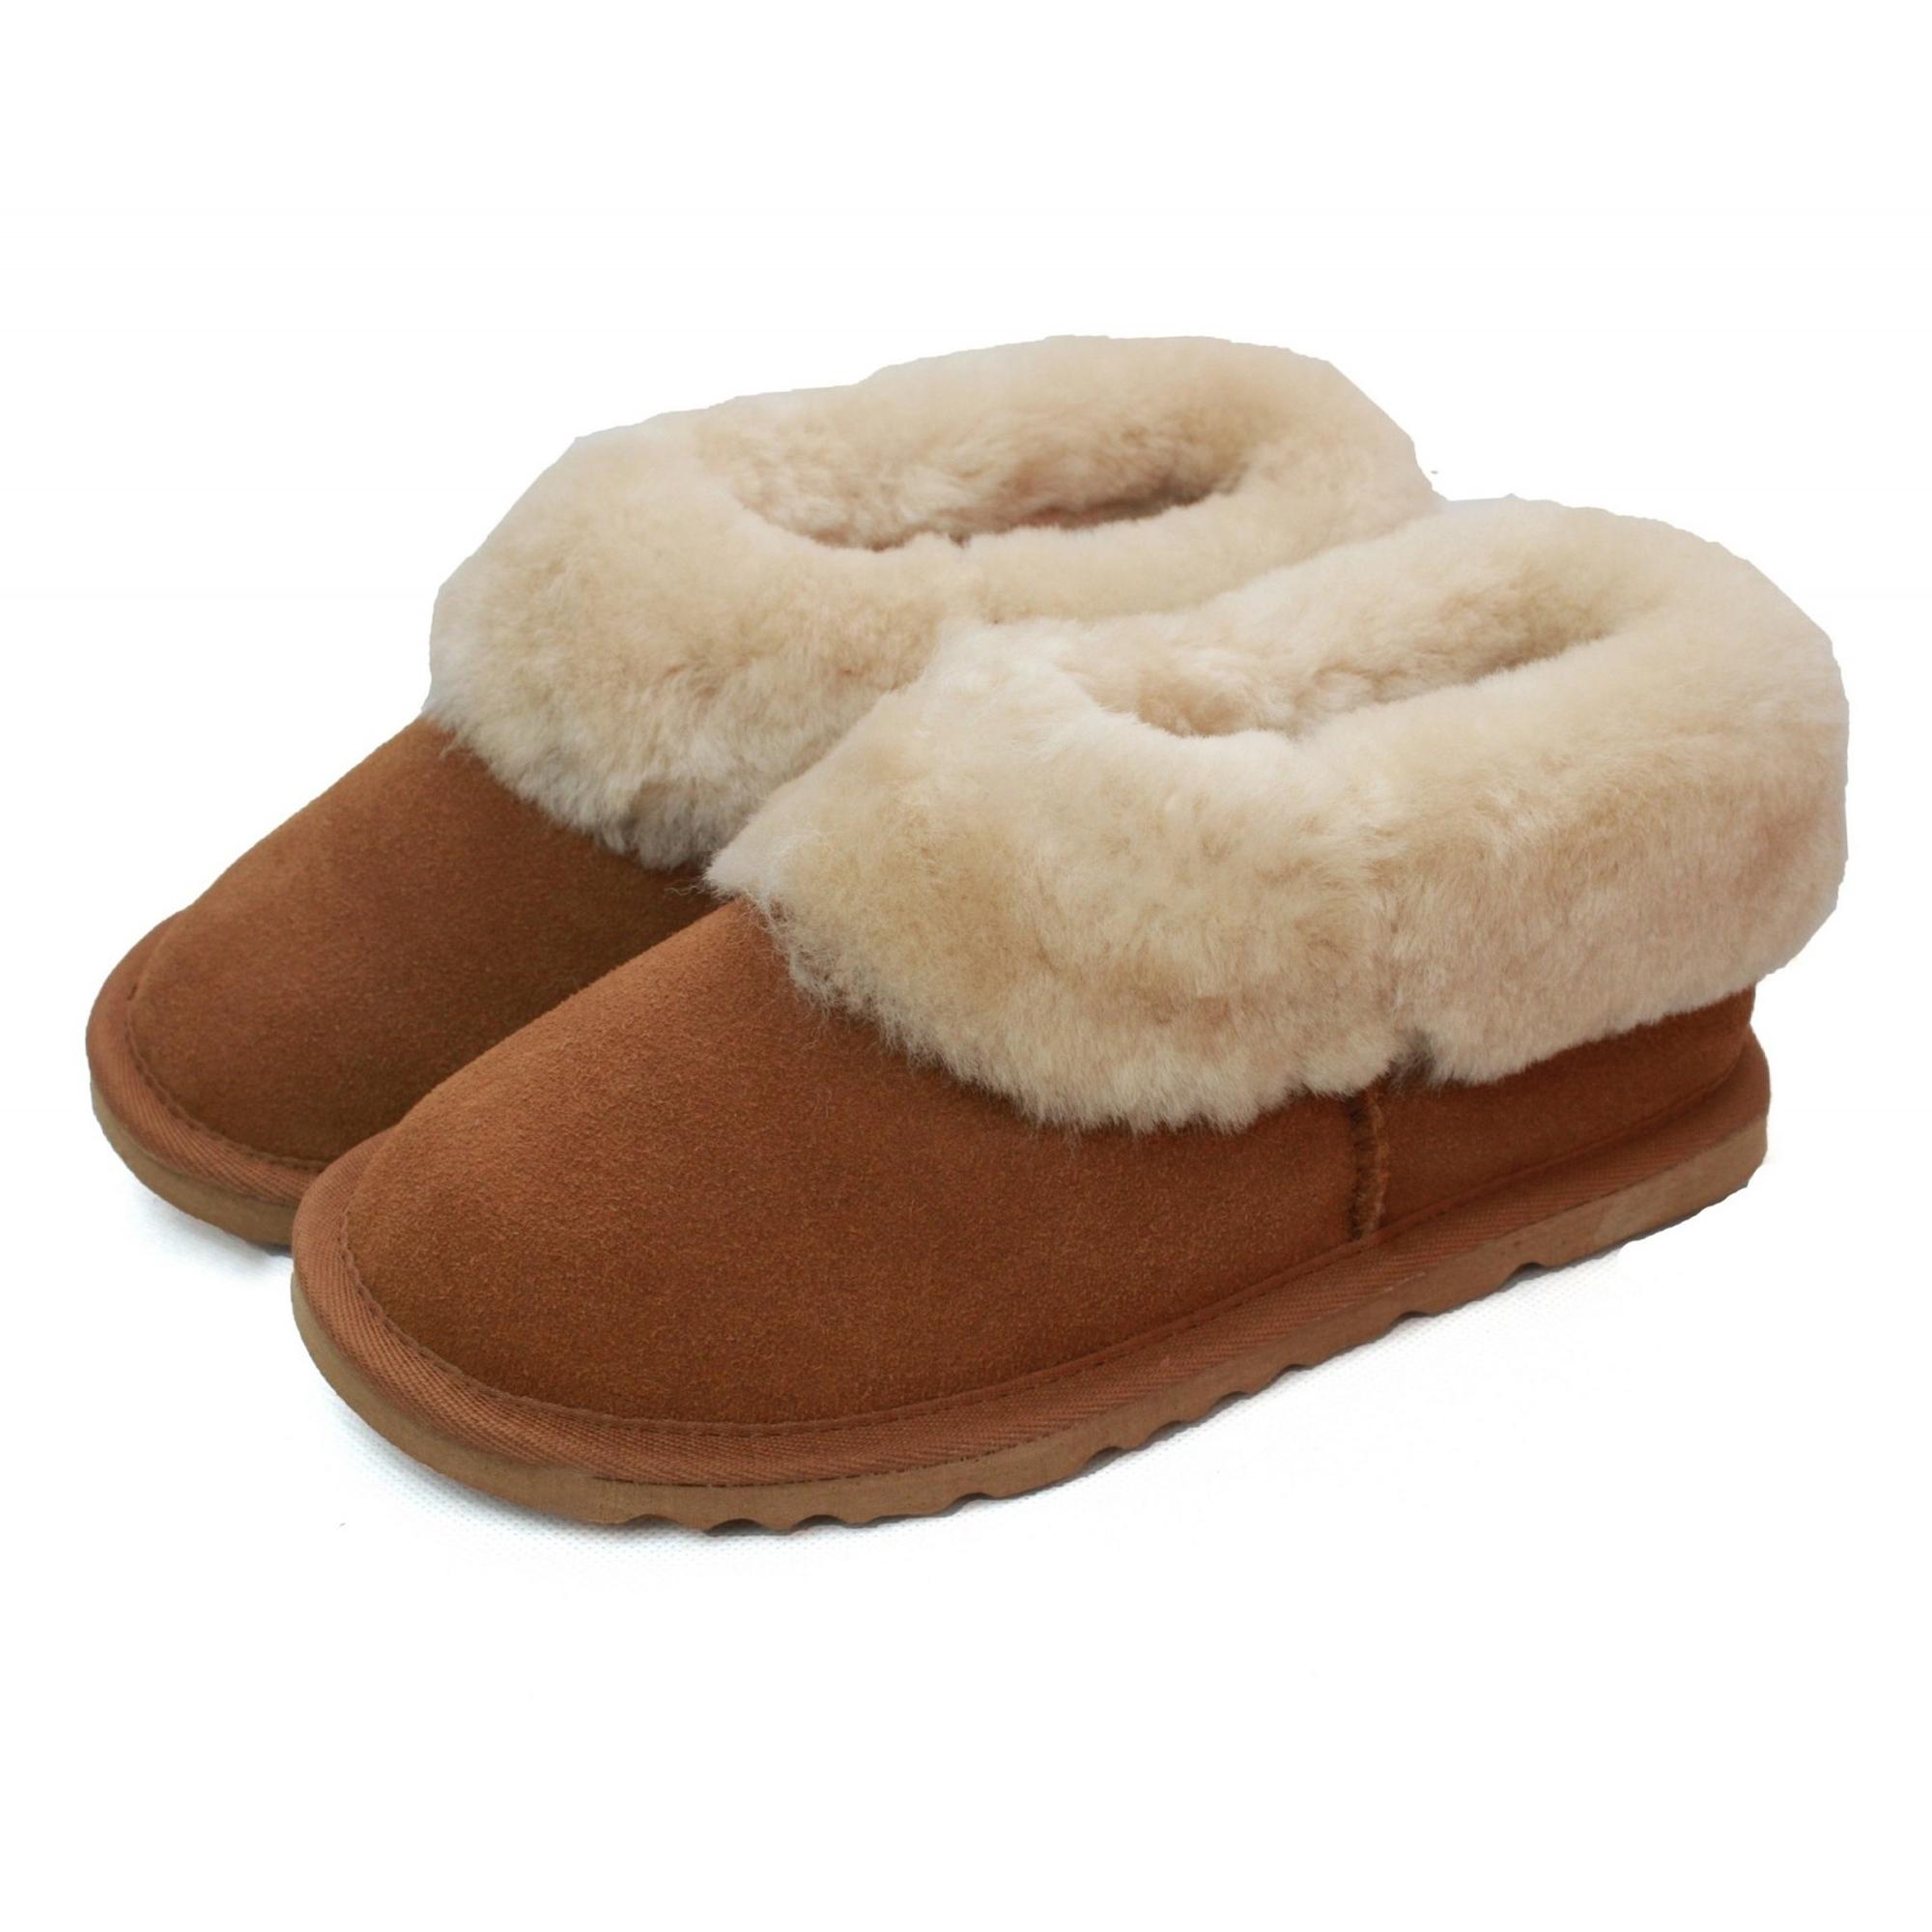 Eastern-Counties-Leather-Womens-Ladies-Sheepskin-Lined-Slipper-Boots-EL156 miniatura 3